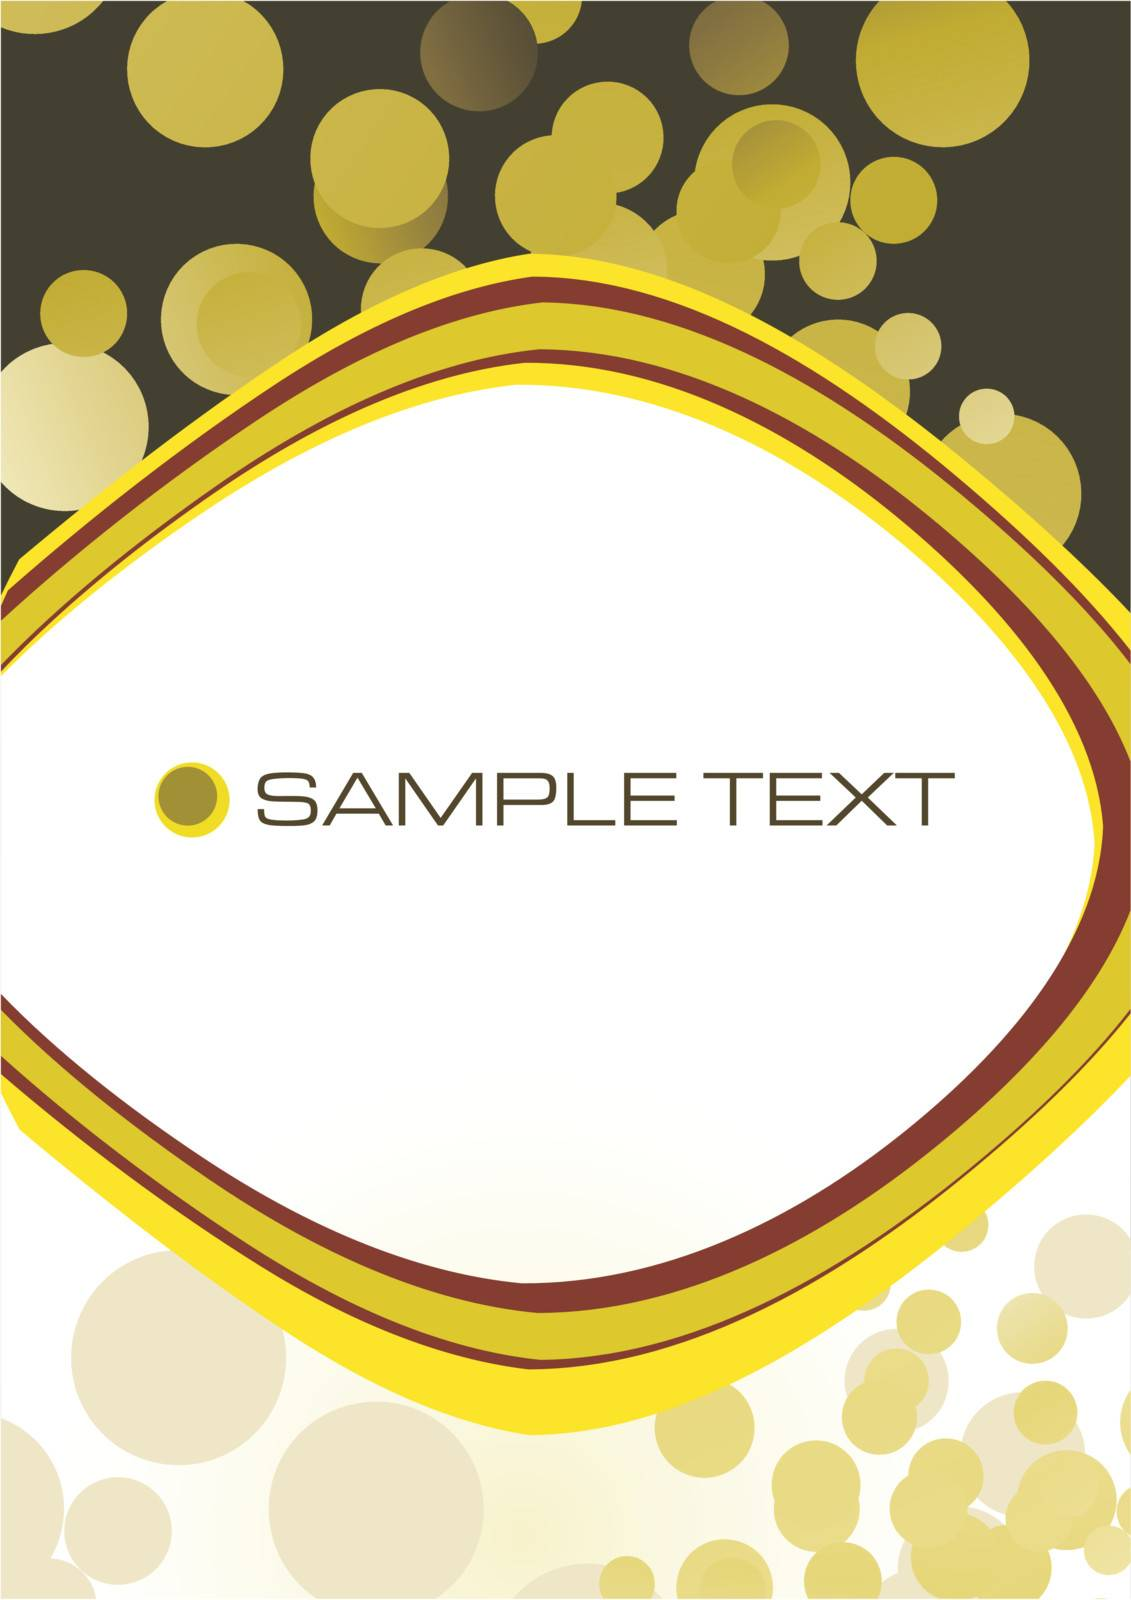 Modern business stationery background, vector illustration